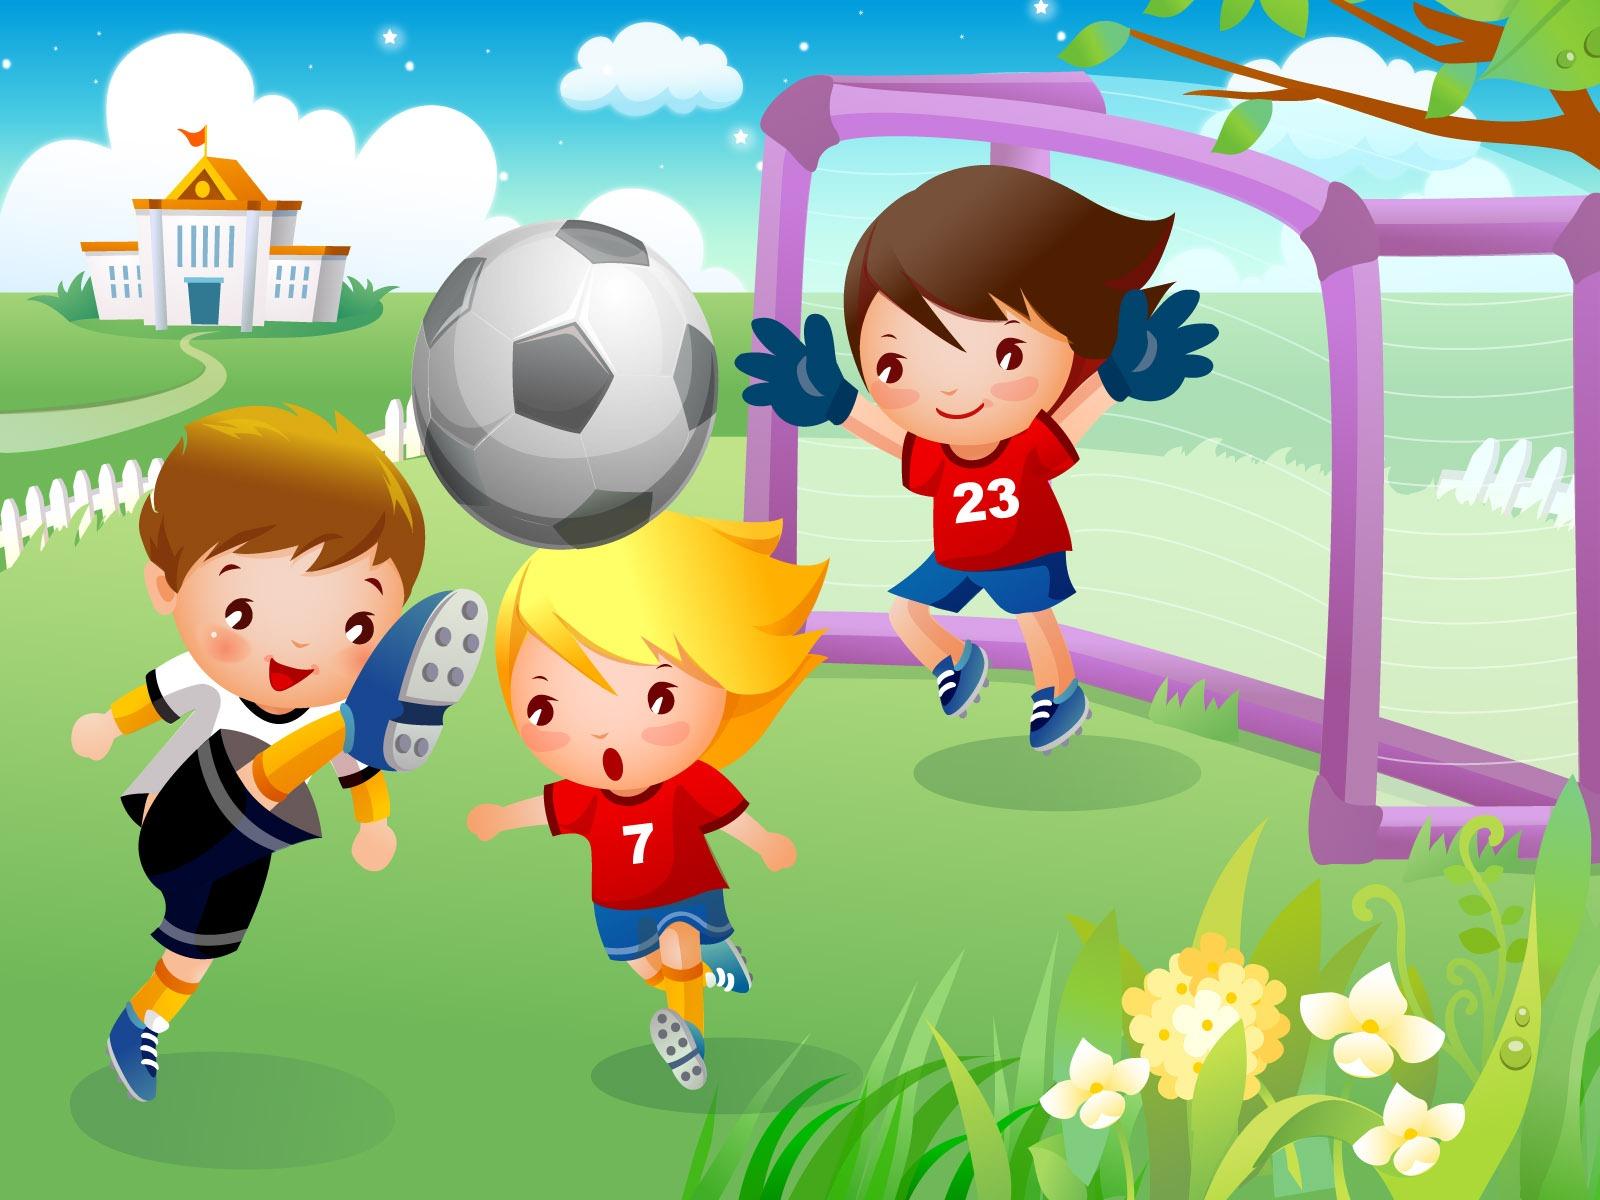 Рисунки дети футбол